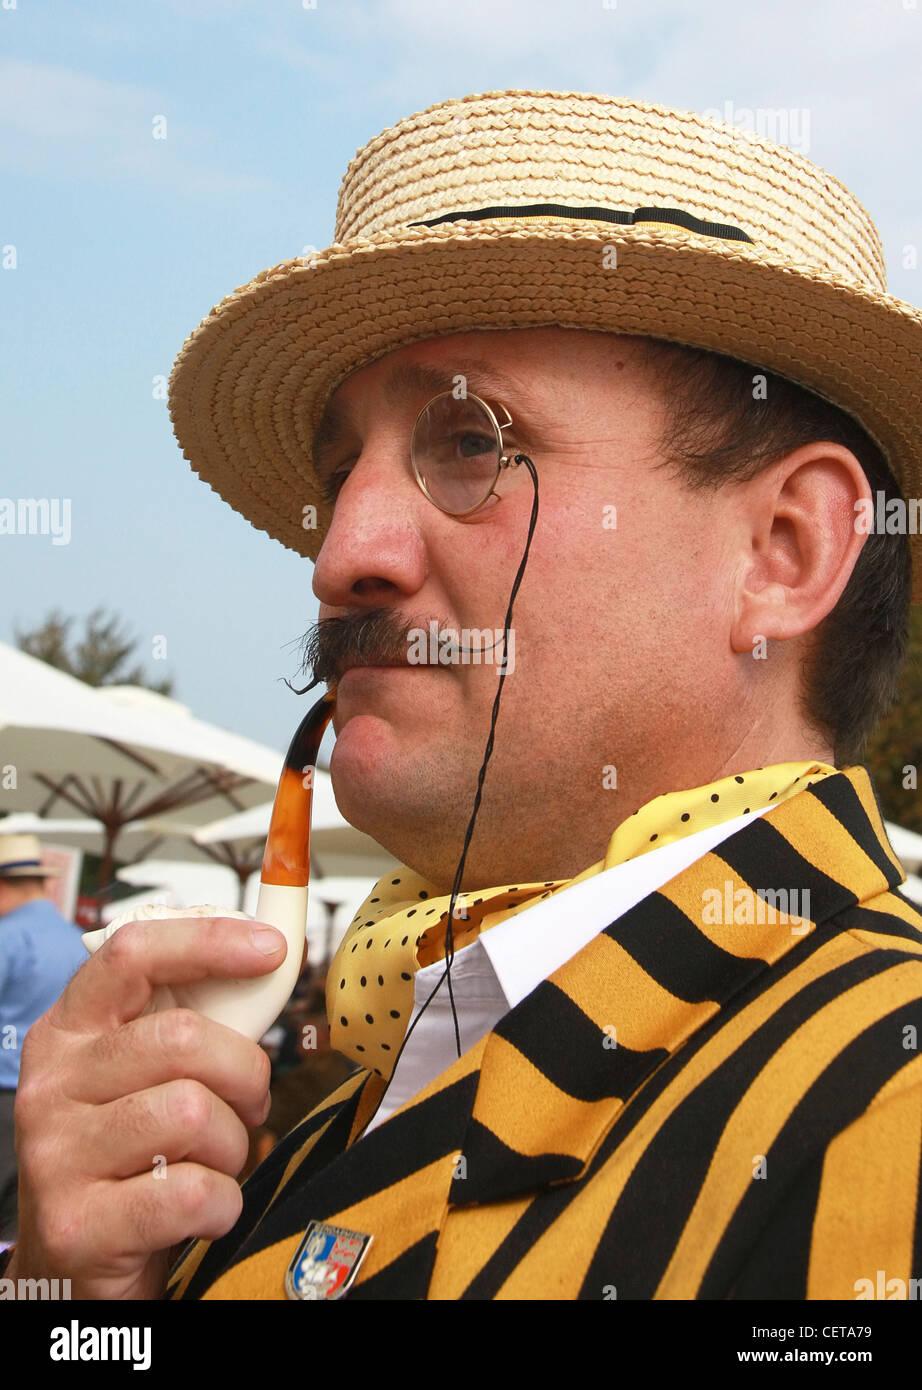 Mann mit Monokel, Strohhut und Pfeife beim Goodwood Revival. Stockbild